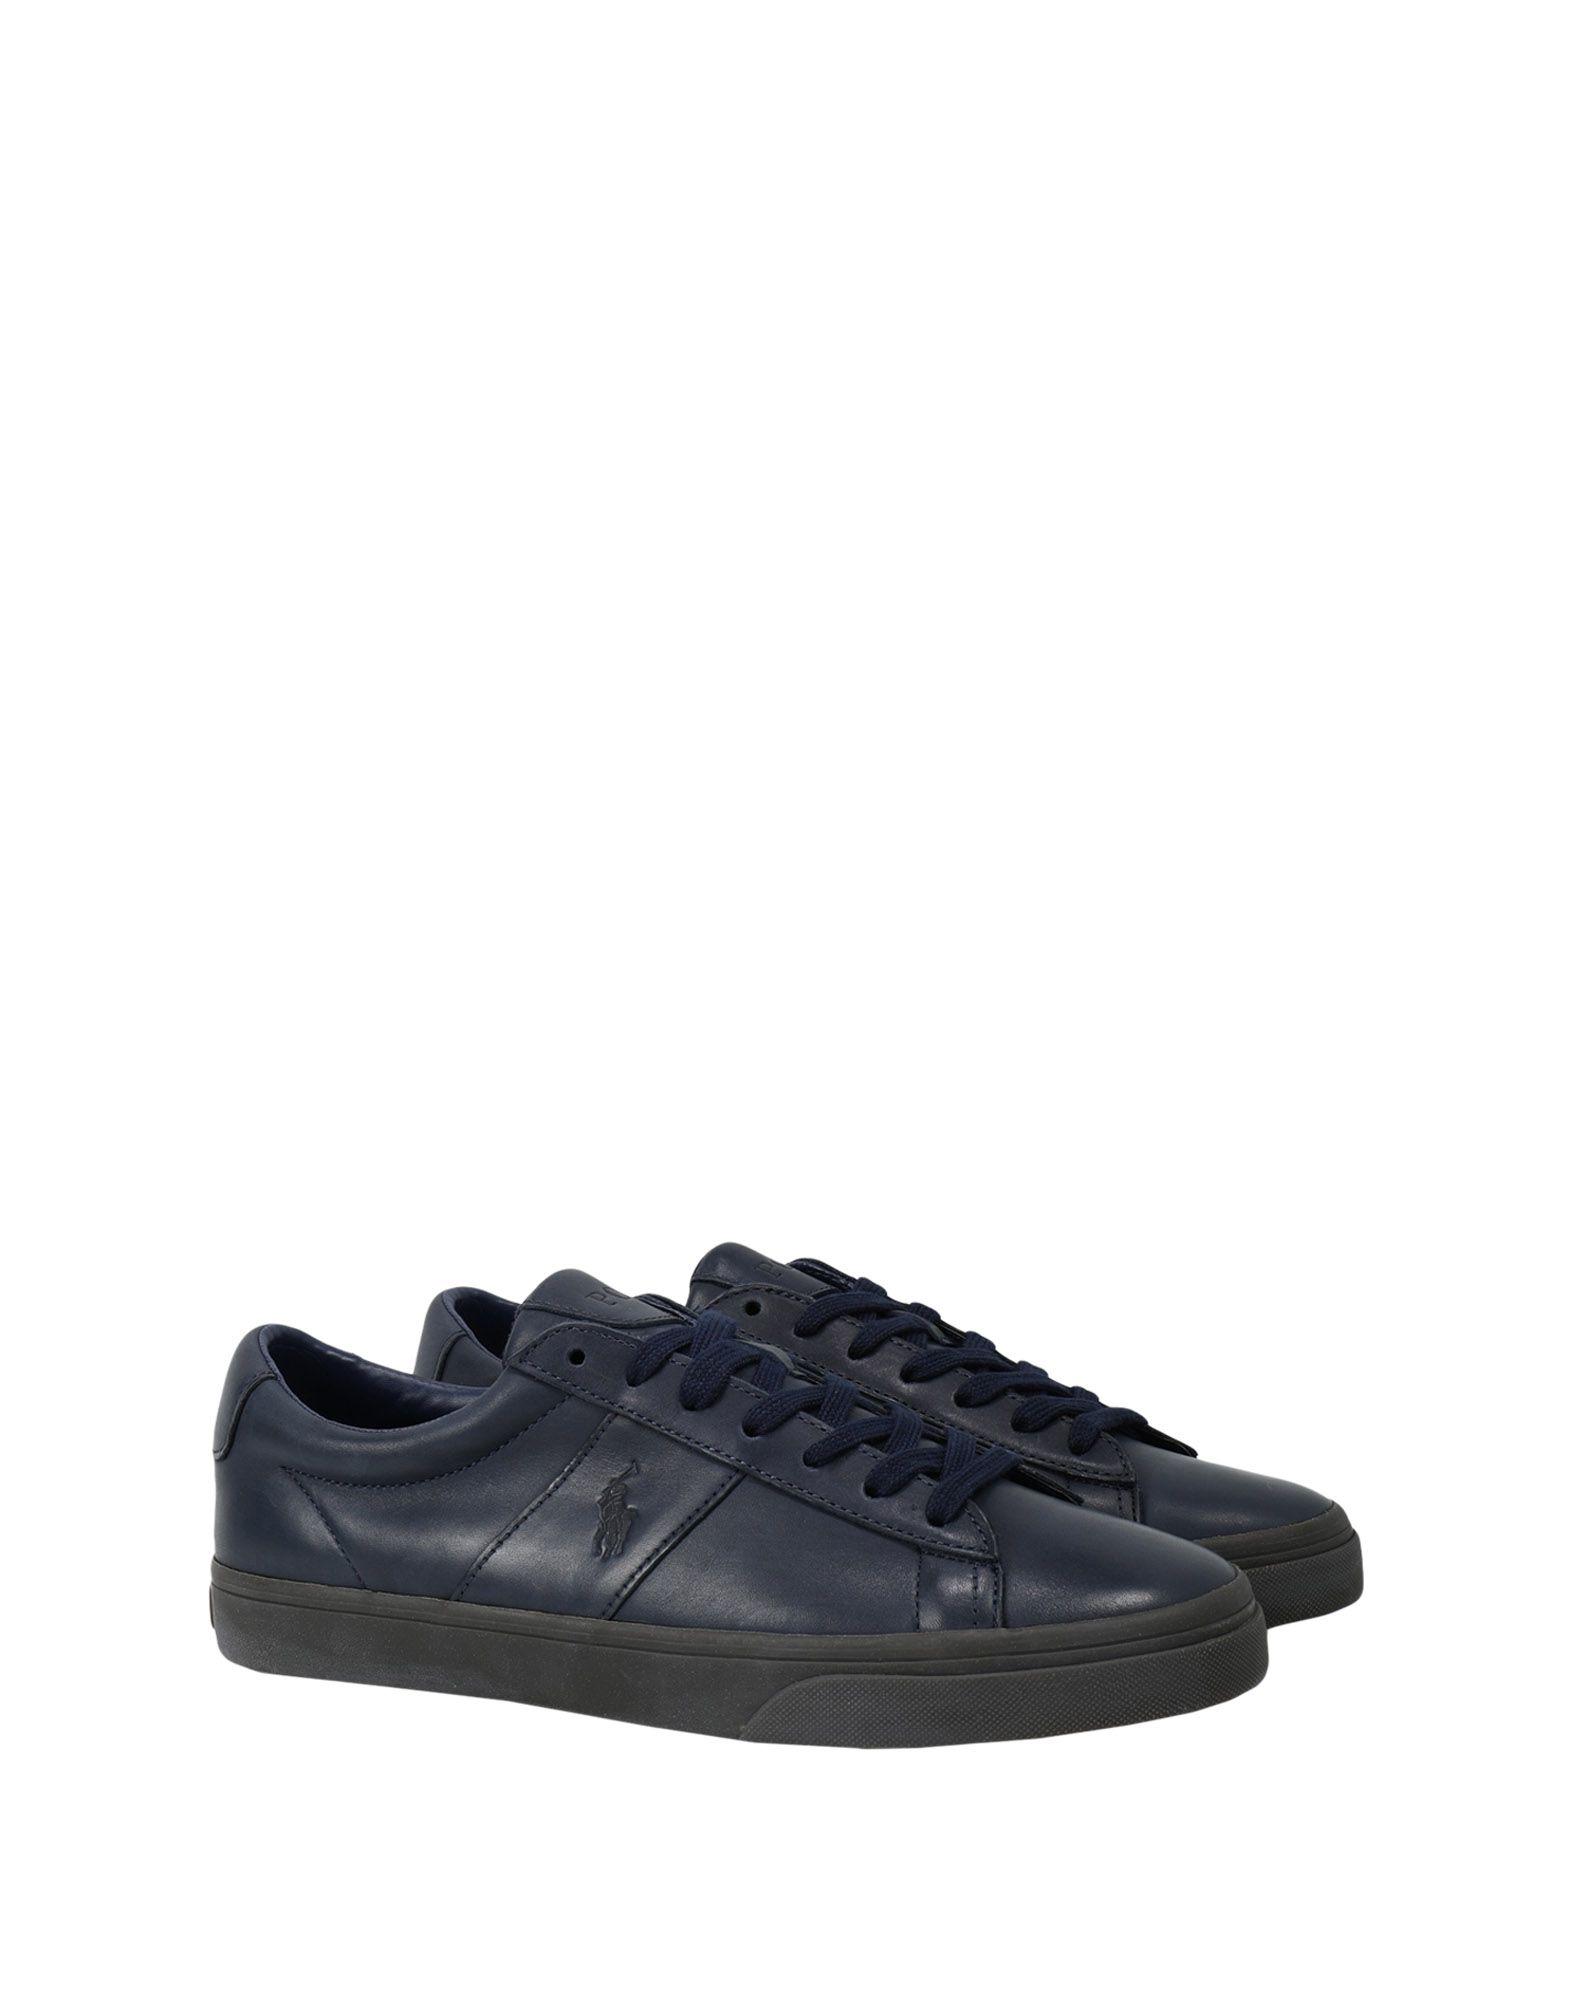 Polo Ralph Lauren Sneakers - Men Men Men Polo Ralph Lauren Sneakers online on  United Kingdom - 11534513JG 6b94e4